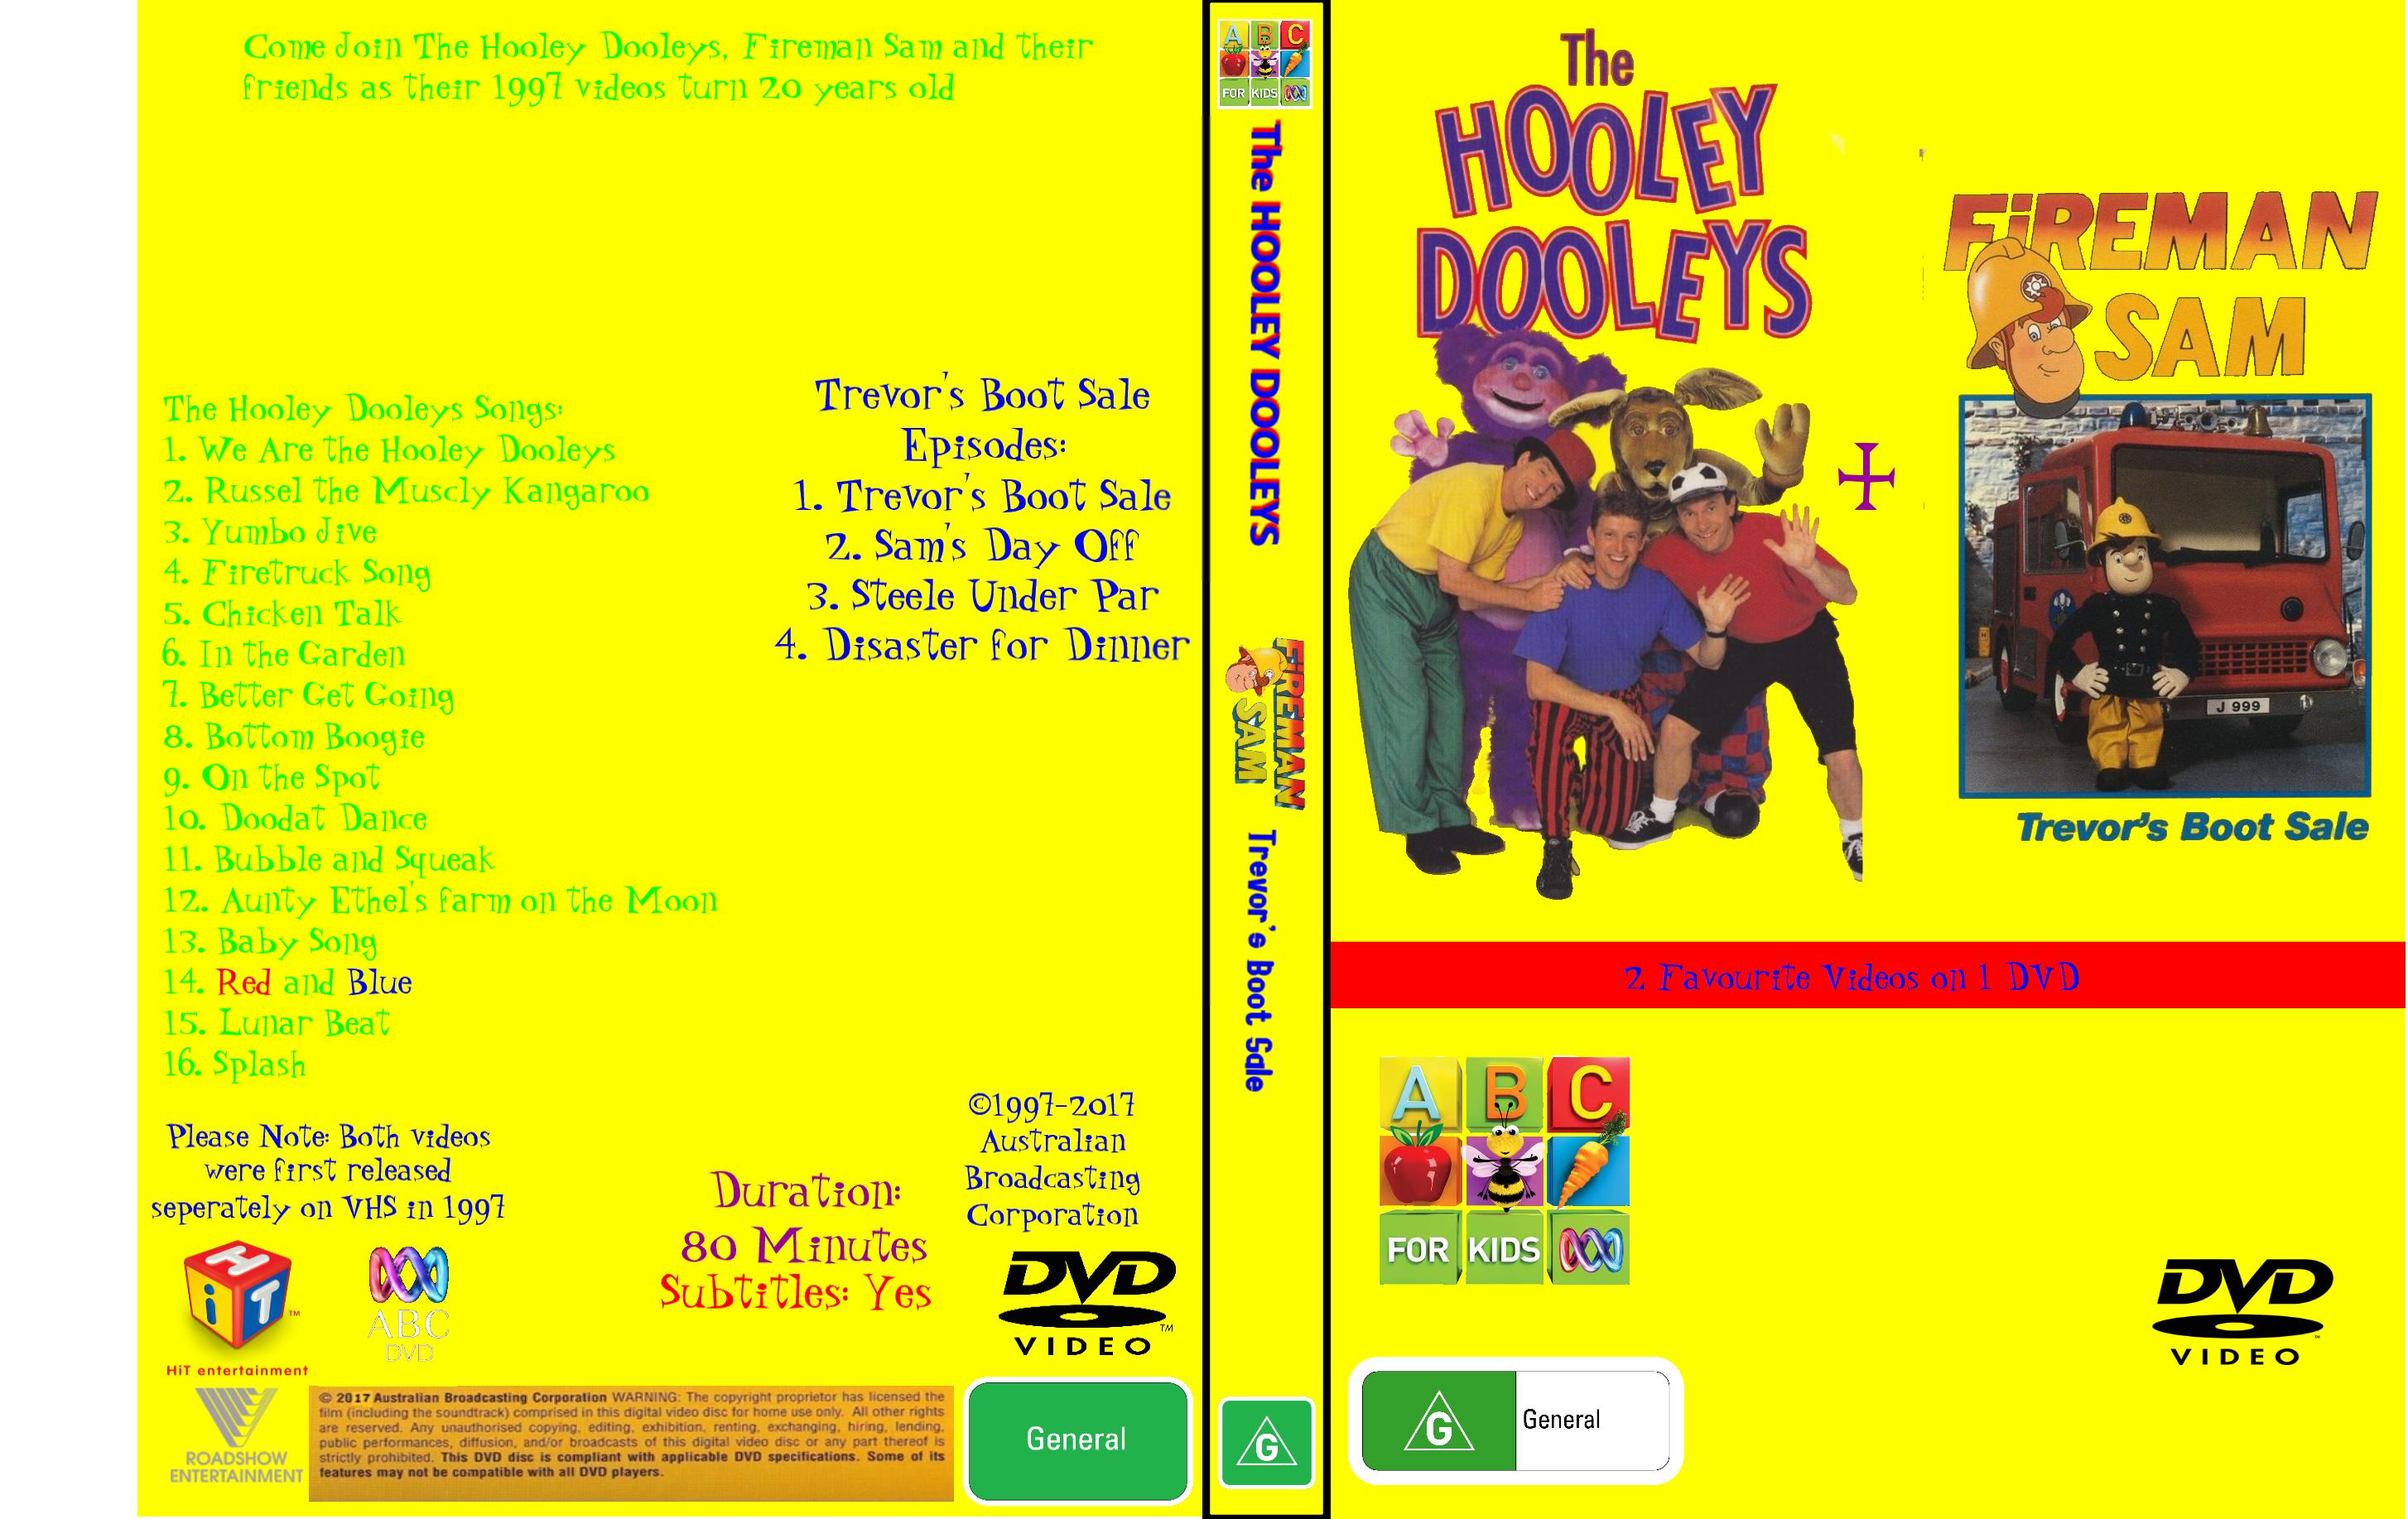 The Hooley Dooleys + Fireman Sam - Trevor's Boot Sale